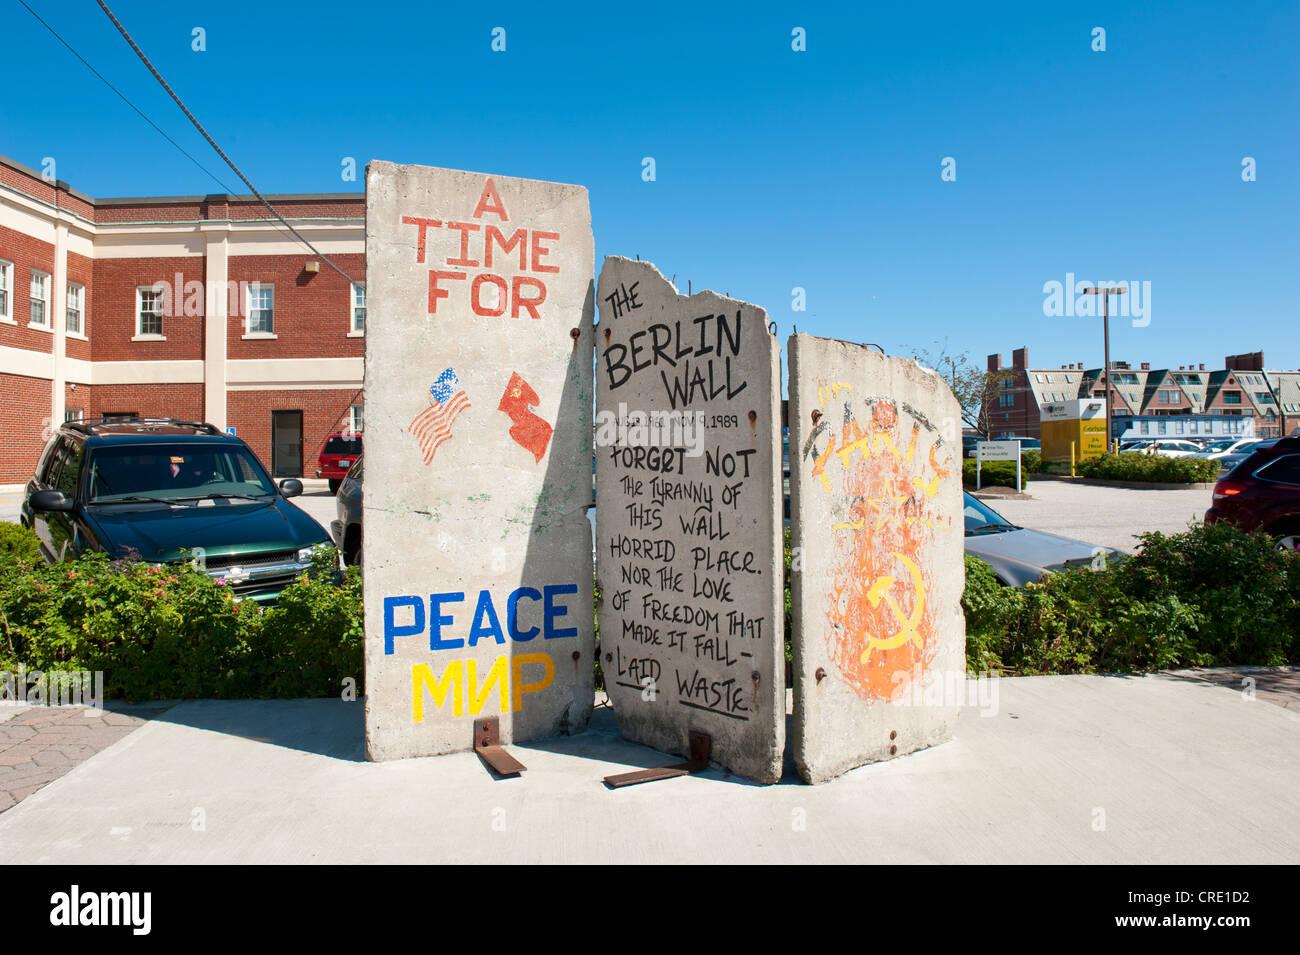 Three panels of the Berlin Wall, graffiti The Berlin Wall, on display at Long Wharf, Portland, Maine, New England, - Stock Image